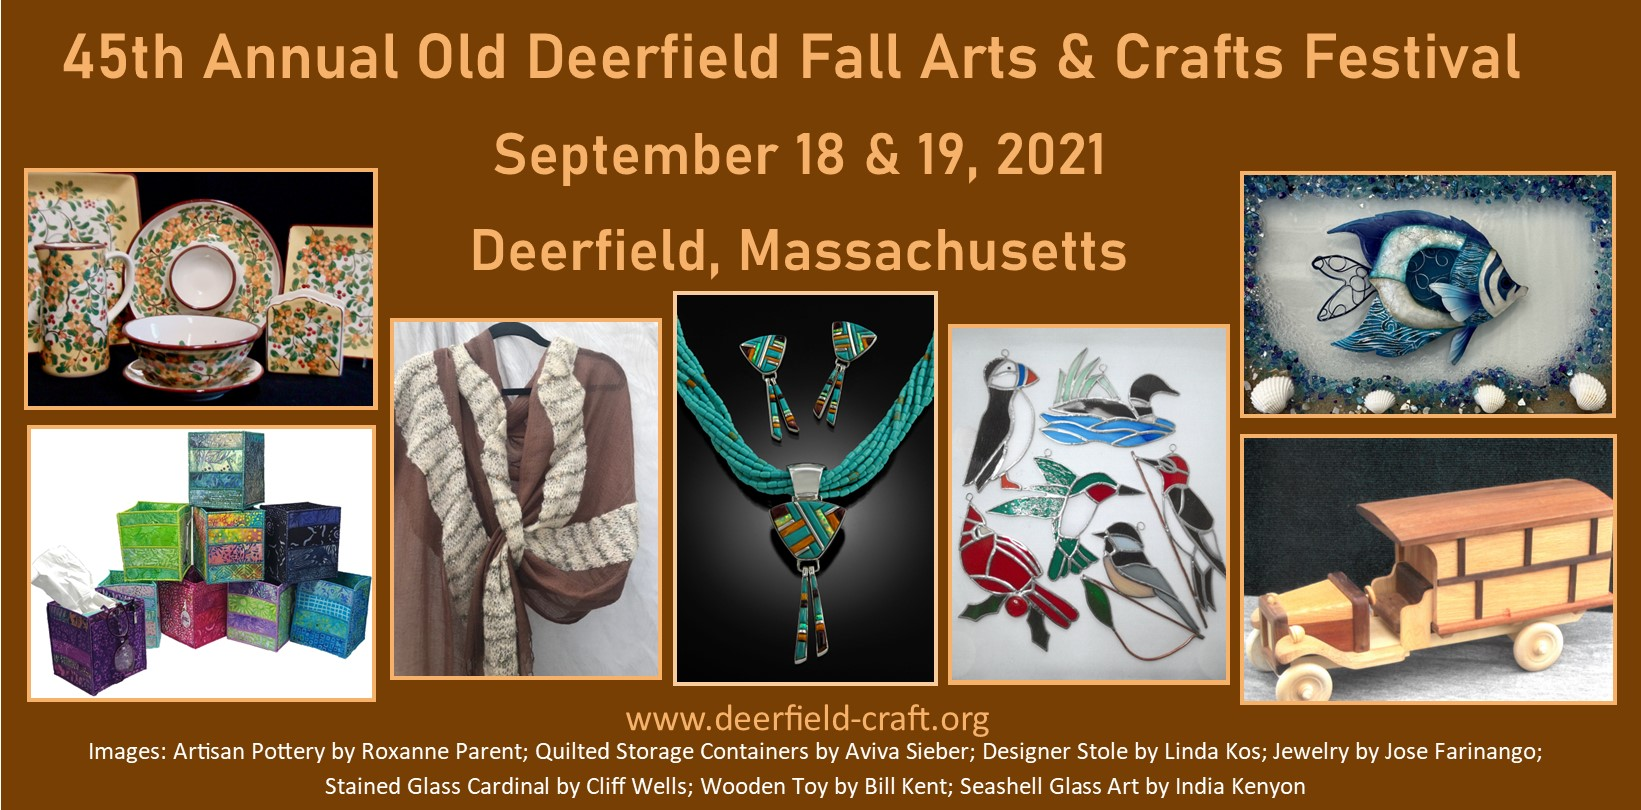 old deerfield falls arts crafts fair